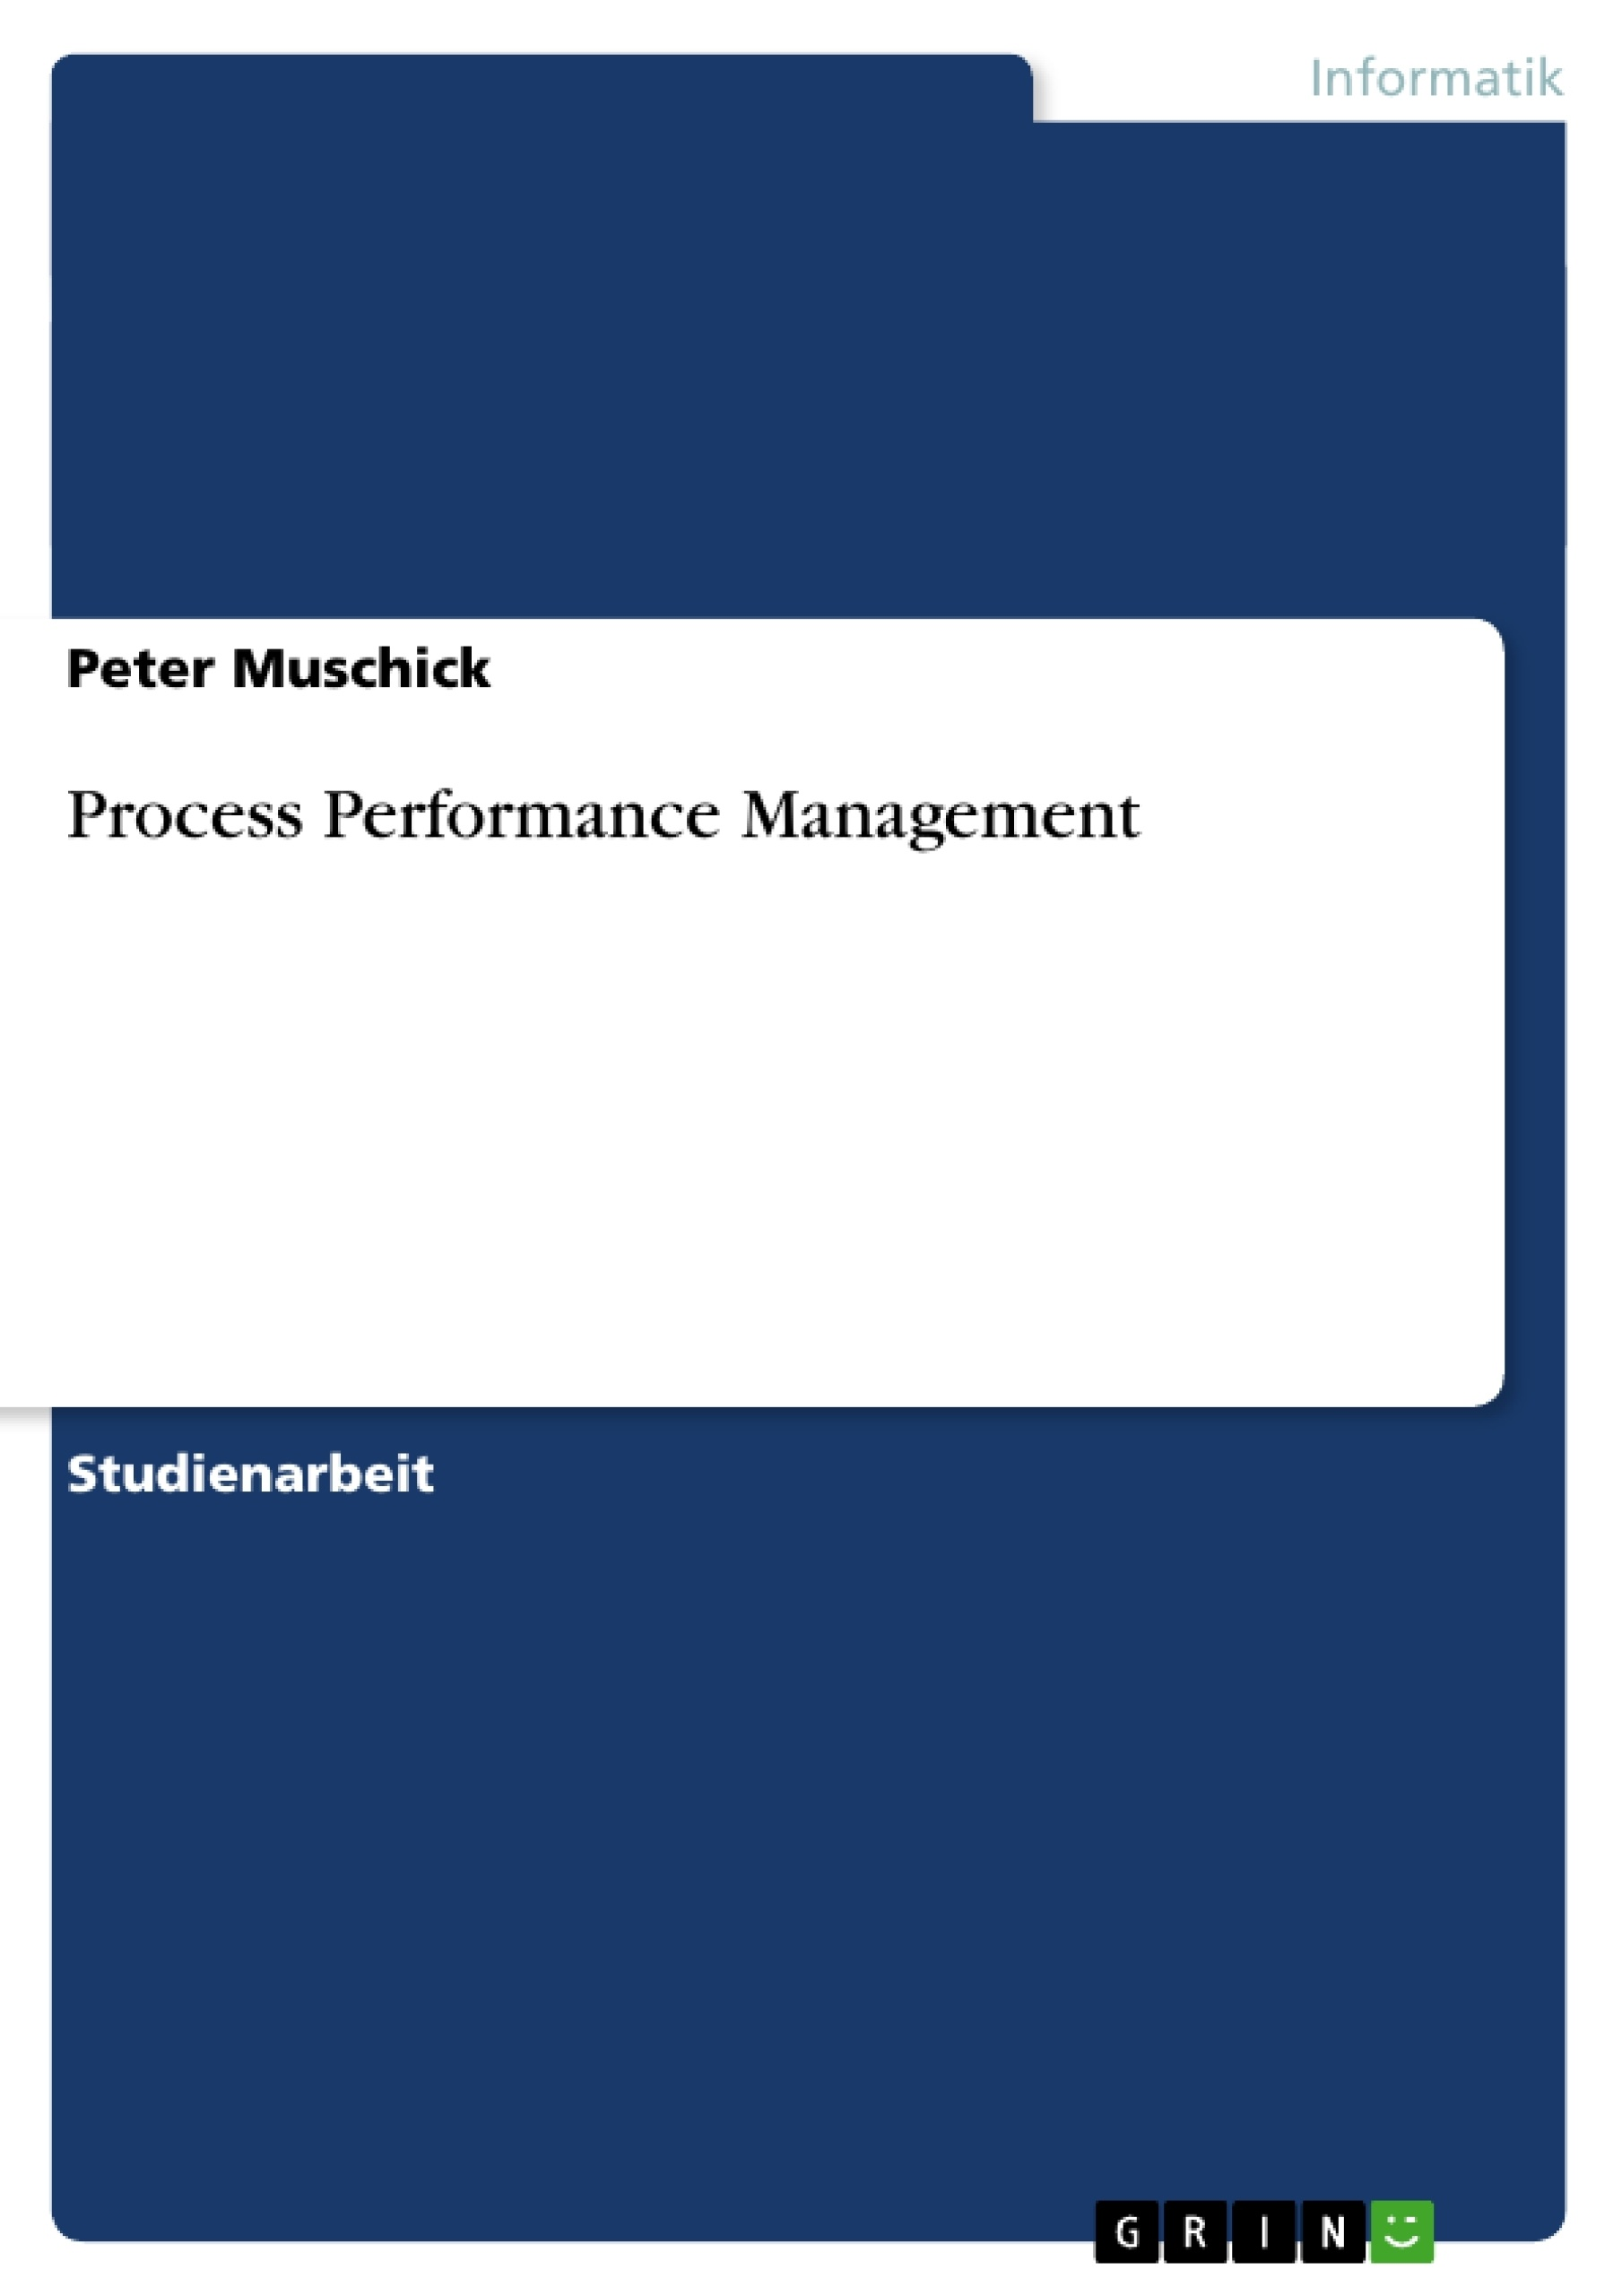 Titel: Process Performance Management